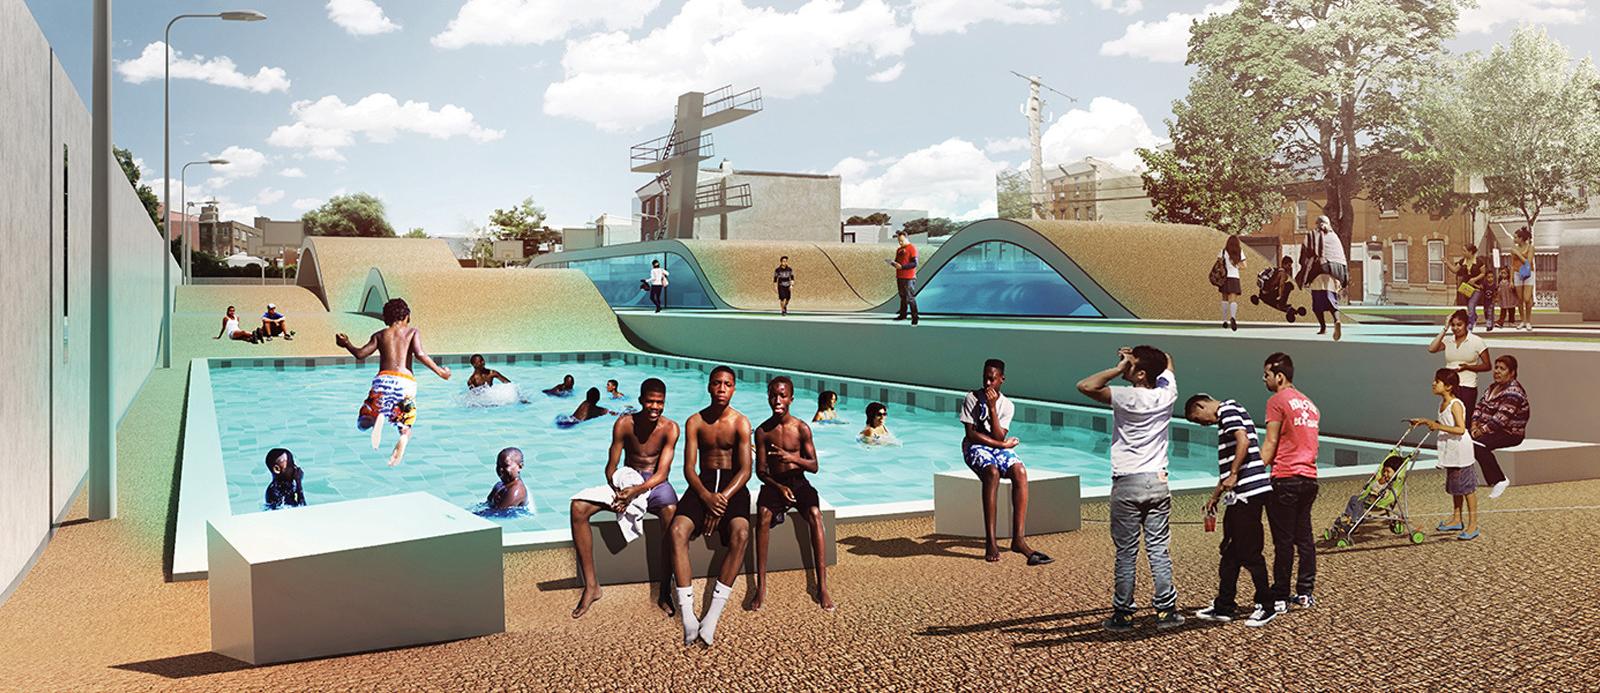 MJZ-Philadelphia-Waterloo-Recreation-Center (2)